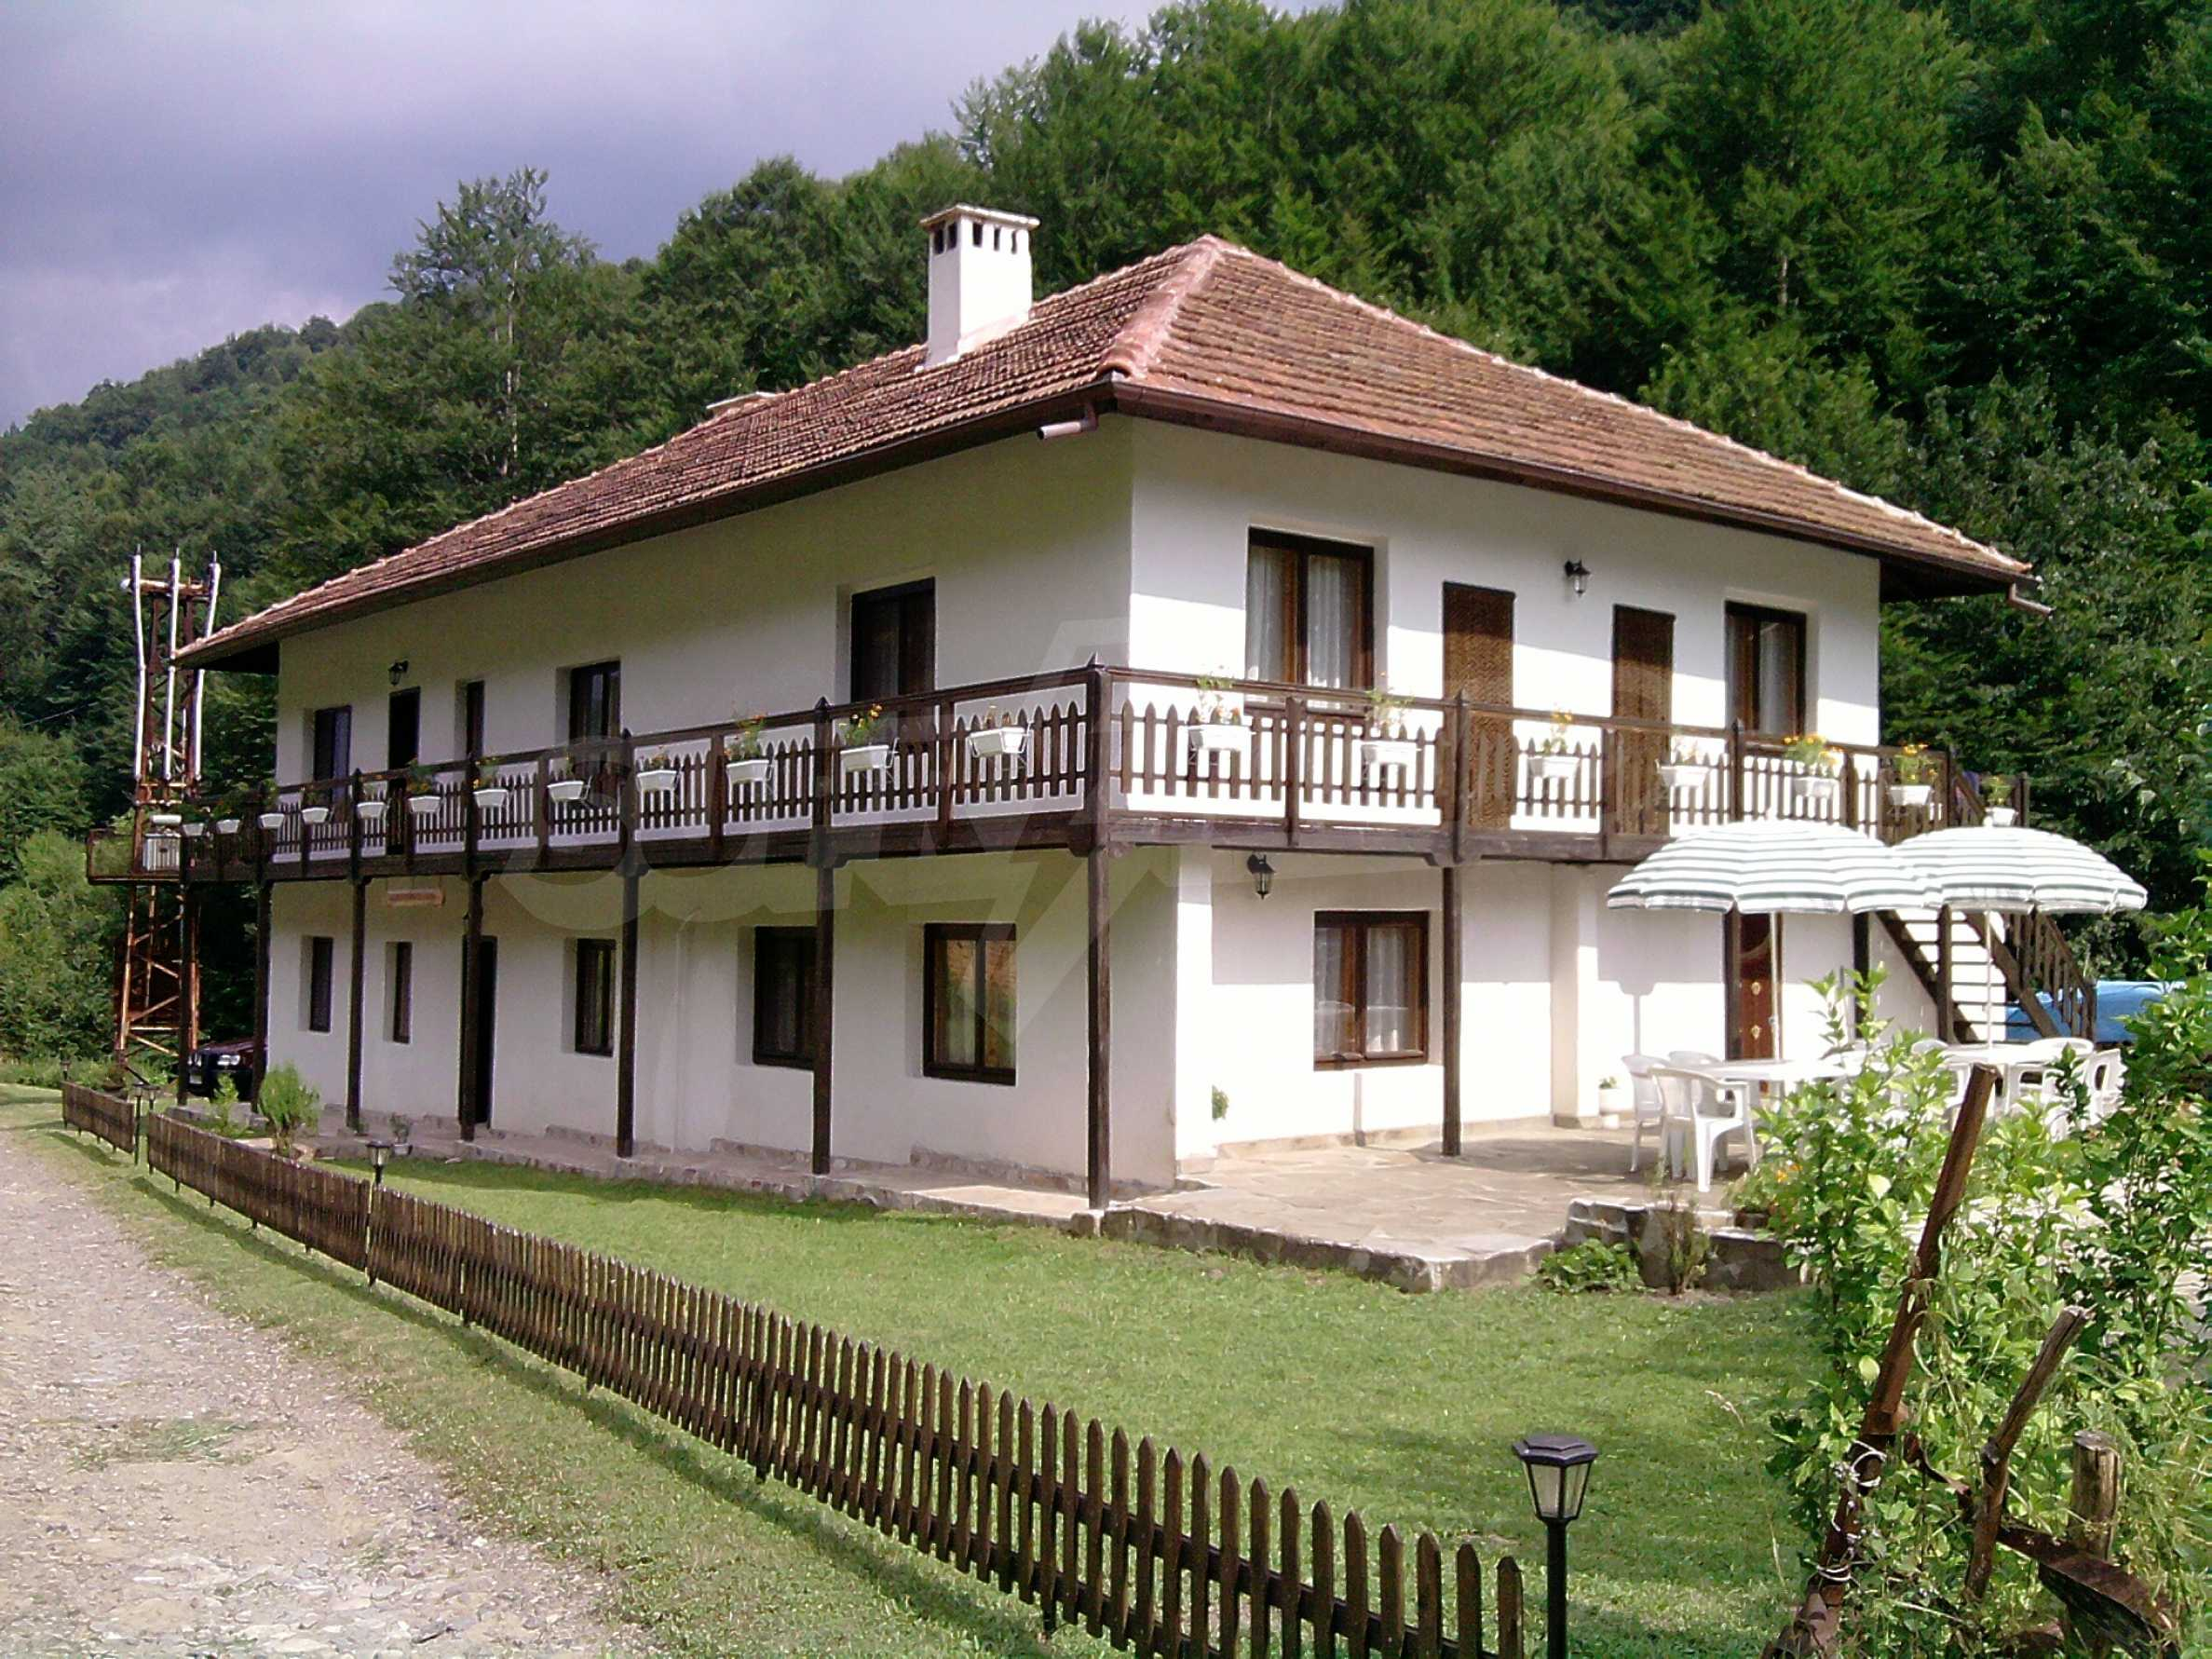 House for sale in Ribaritsa, Bulgaria - Sales - house.